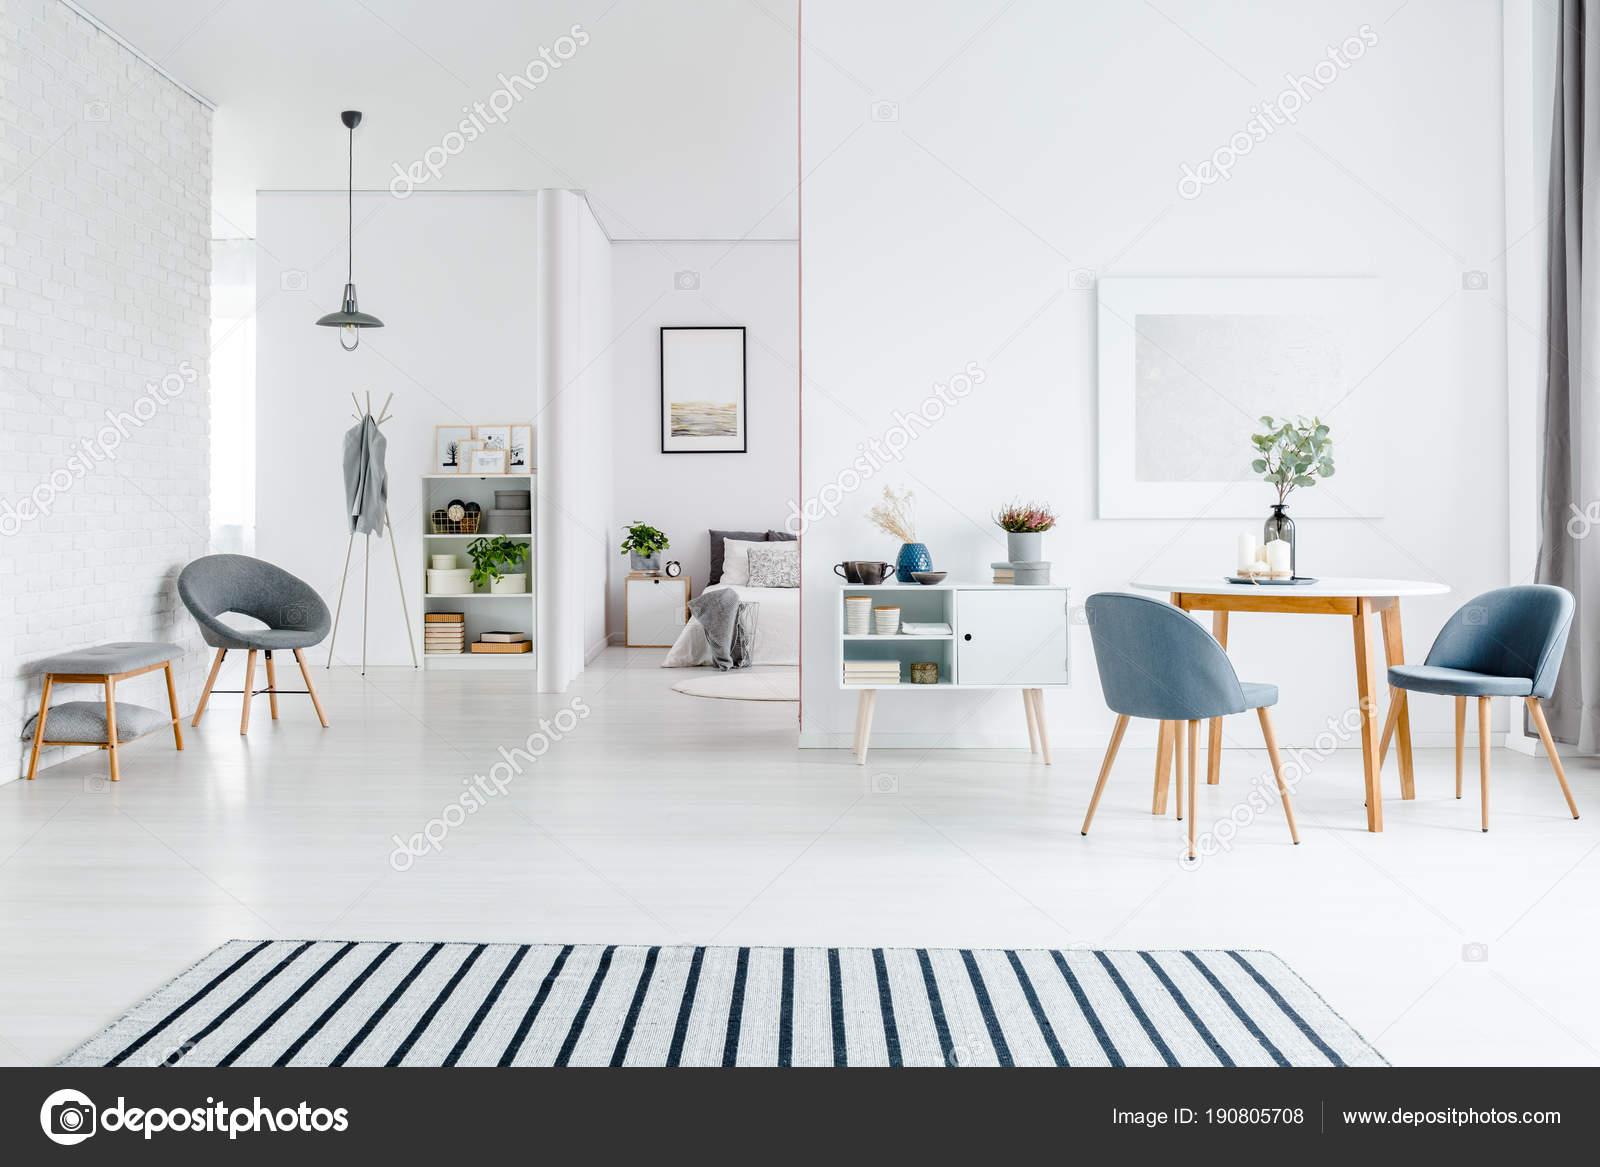 Ruime wit woonkamer interieur — Stockfoto © photographee.eu #190805708